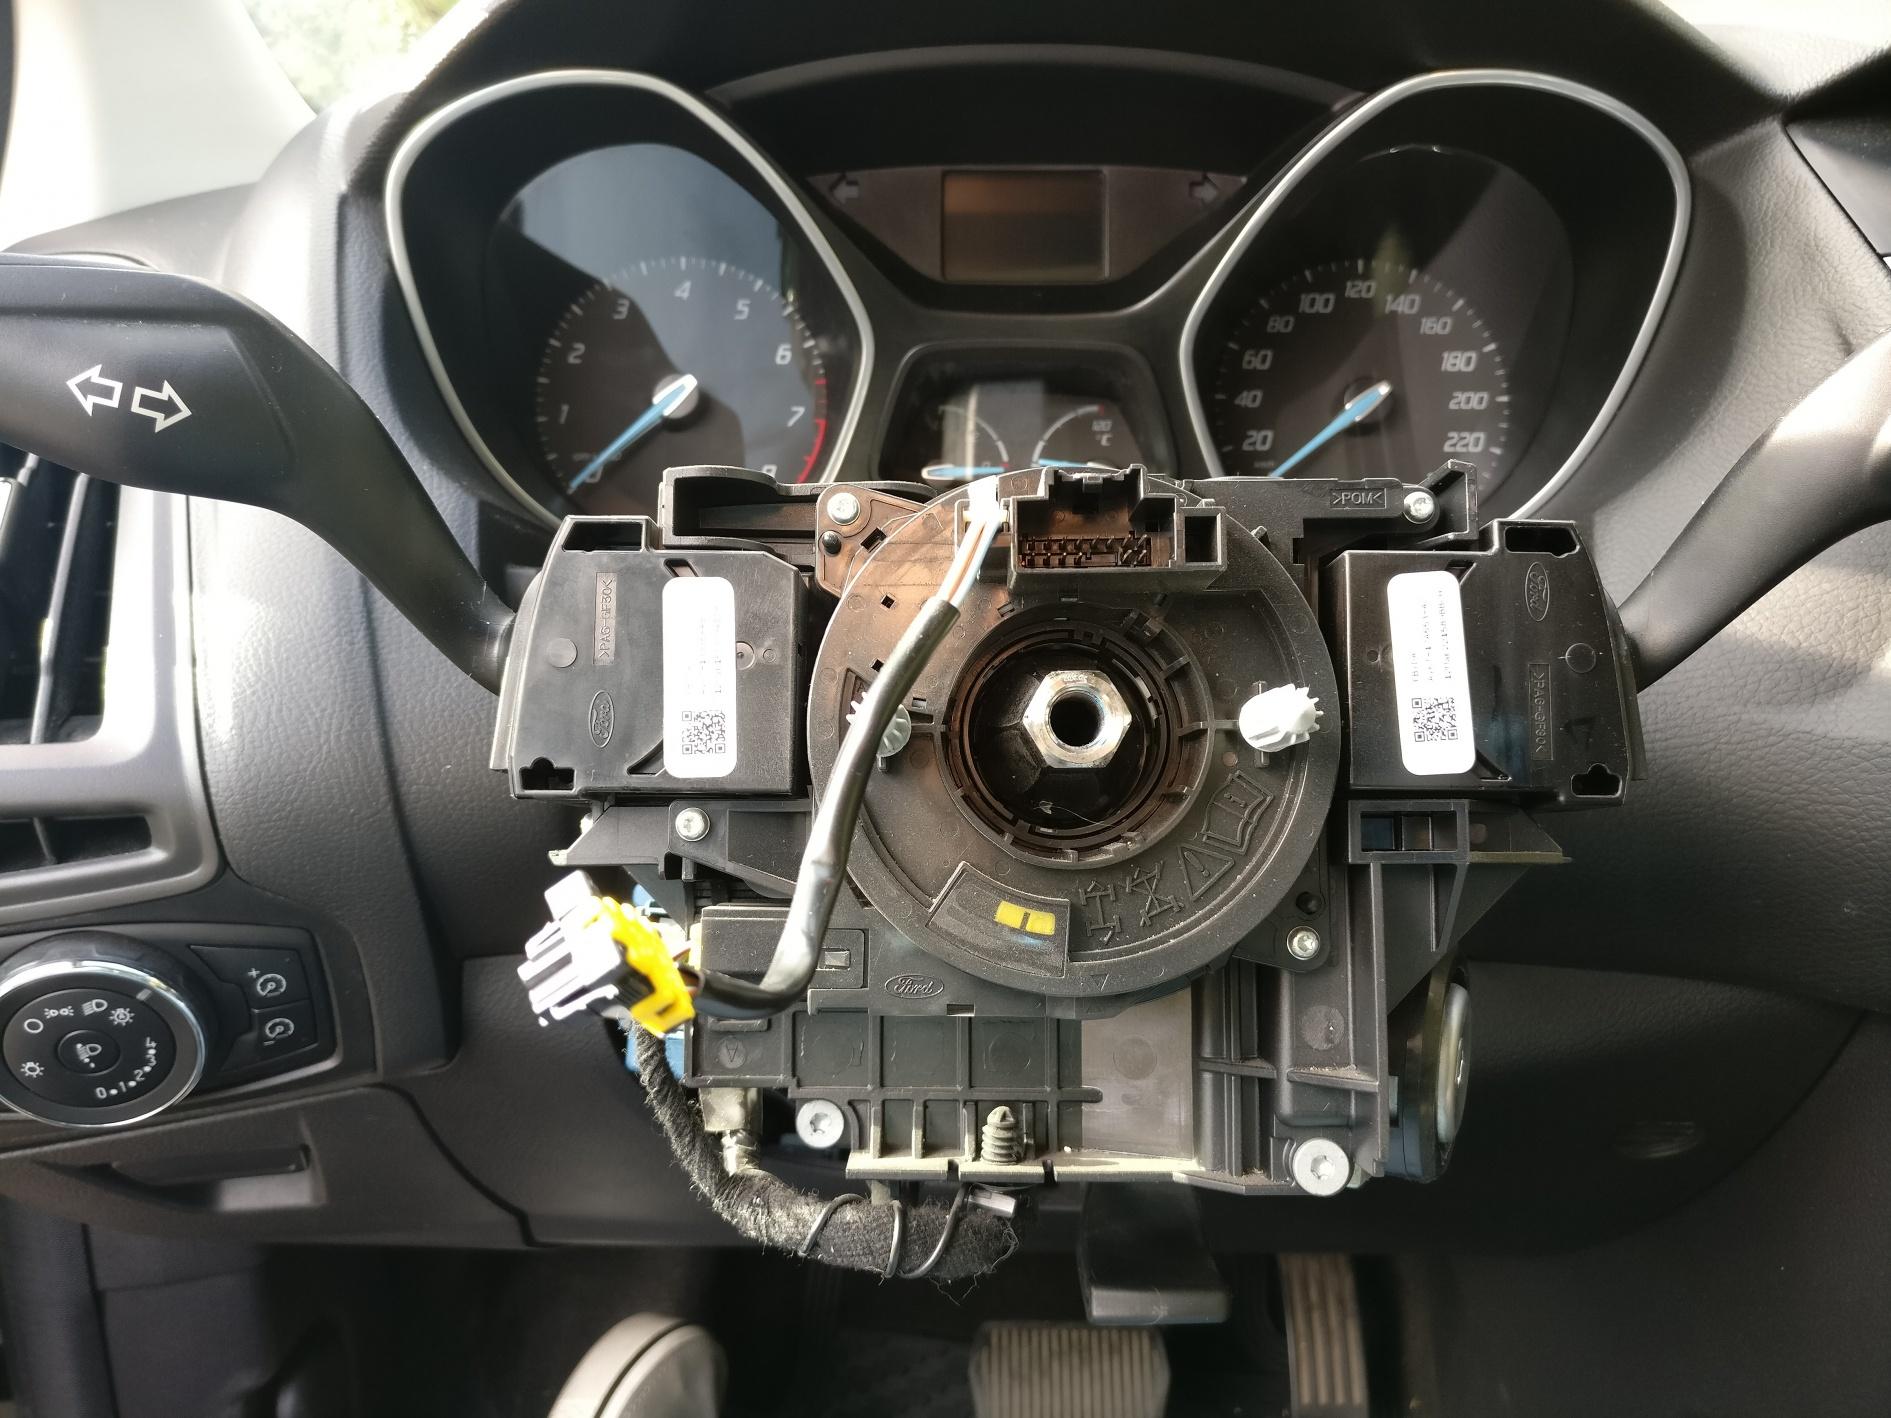 2004 Ford Focus Cruise Control Wiring Diagram F650 Fuse Diagrams Topcruise Installation Fails Please Advise